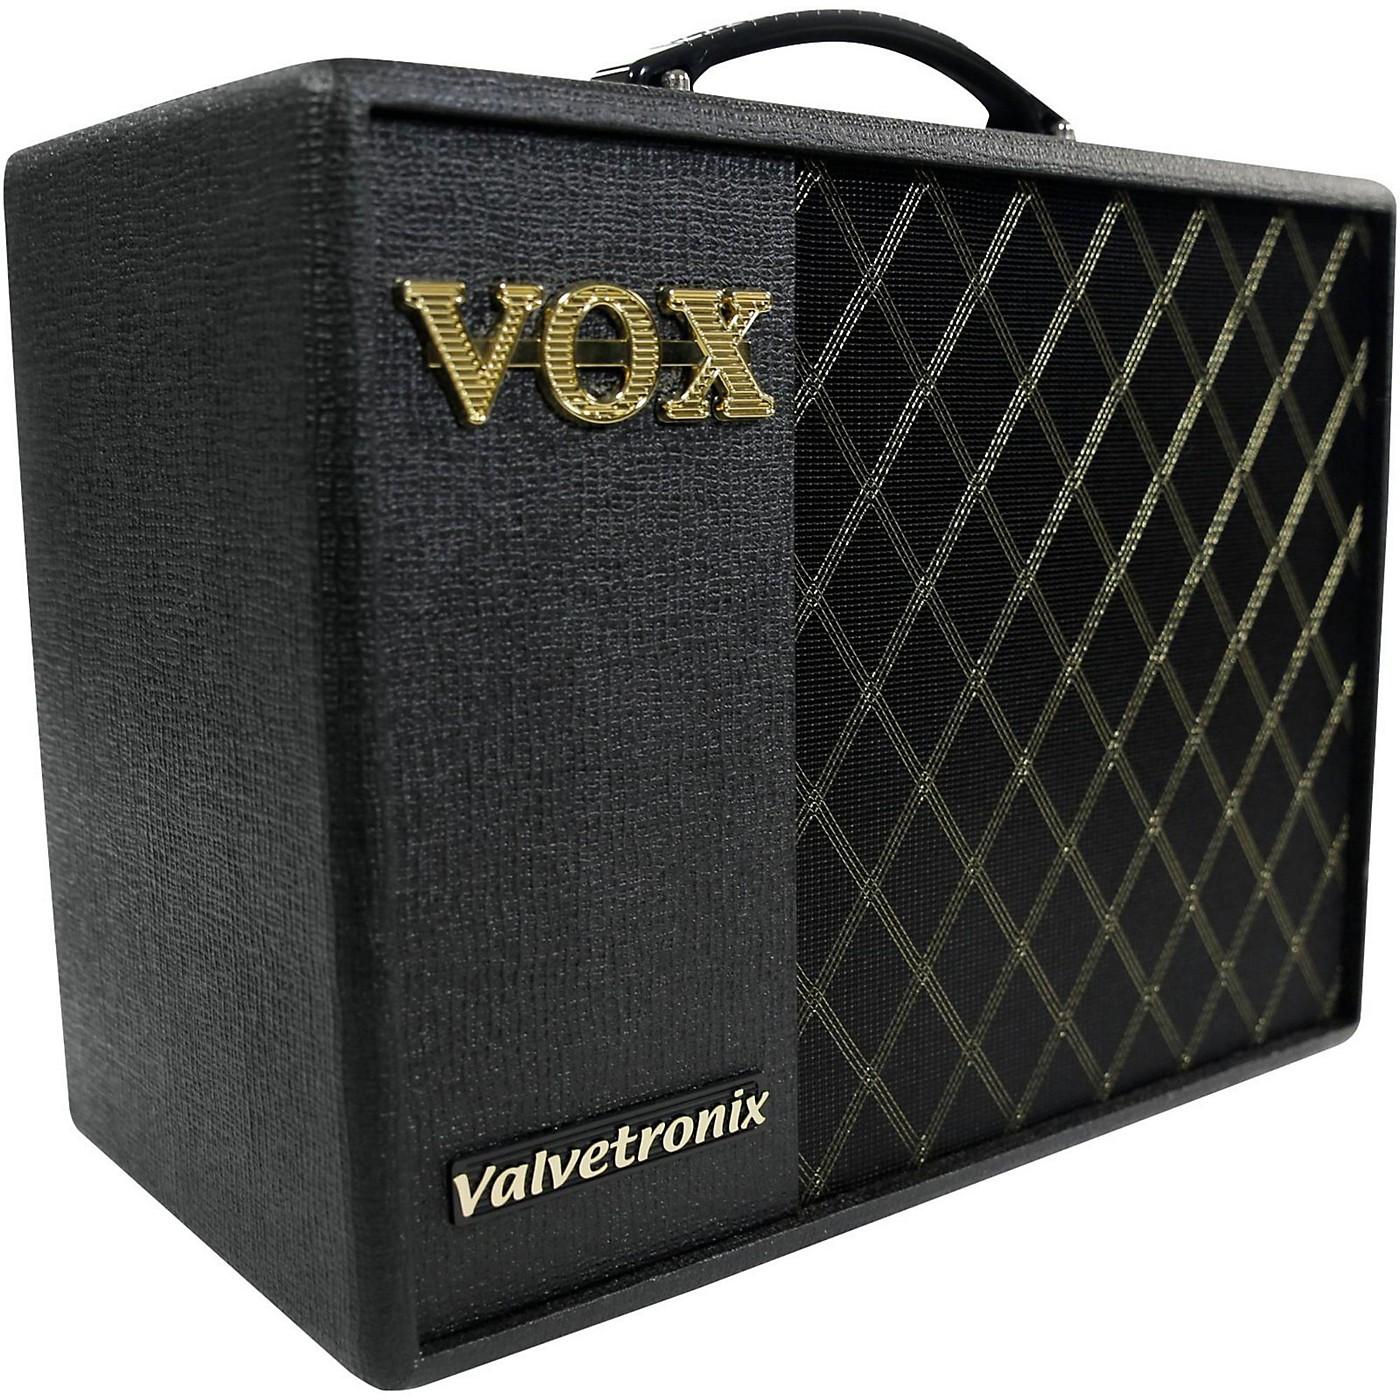 Vox Valvetronix VT40X 40W 1x10 Guitar Modeling Combo Amp thumbnail